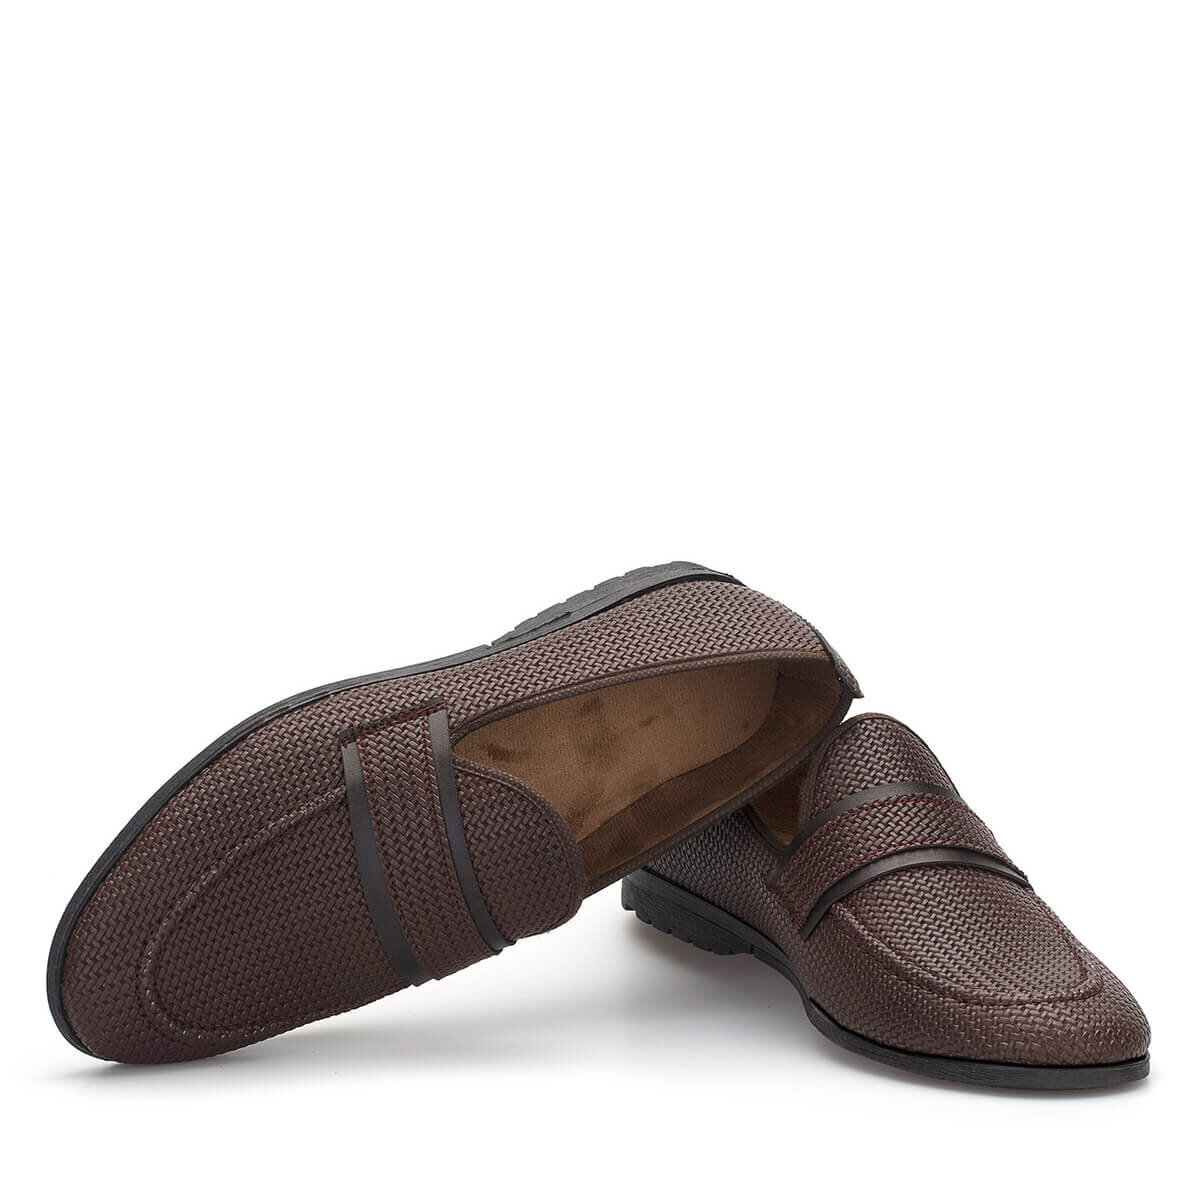 Kahverengi Erkek Loafer Ayakkabı LFR129KHKHX